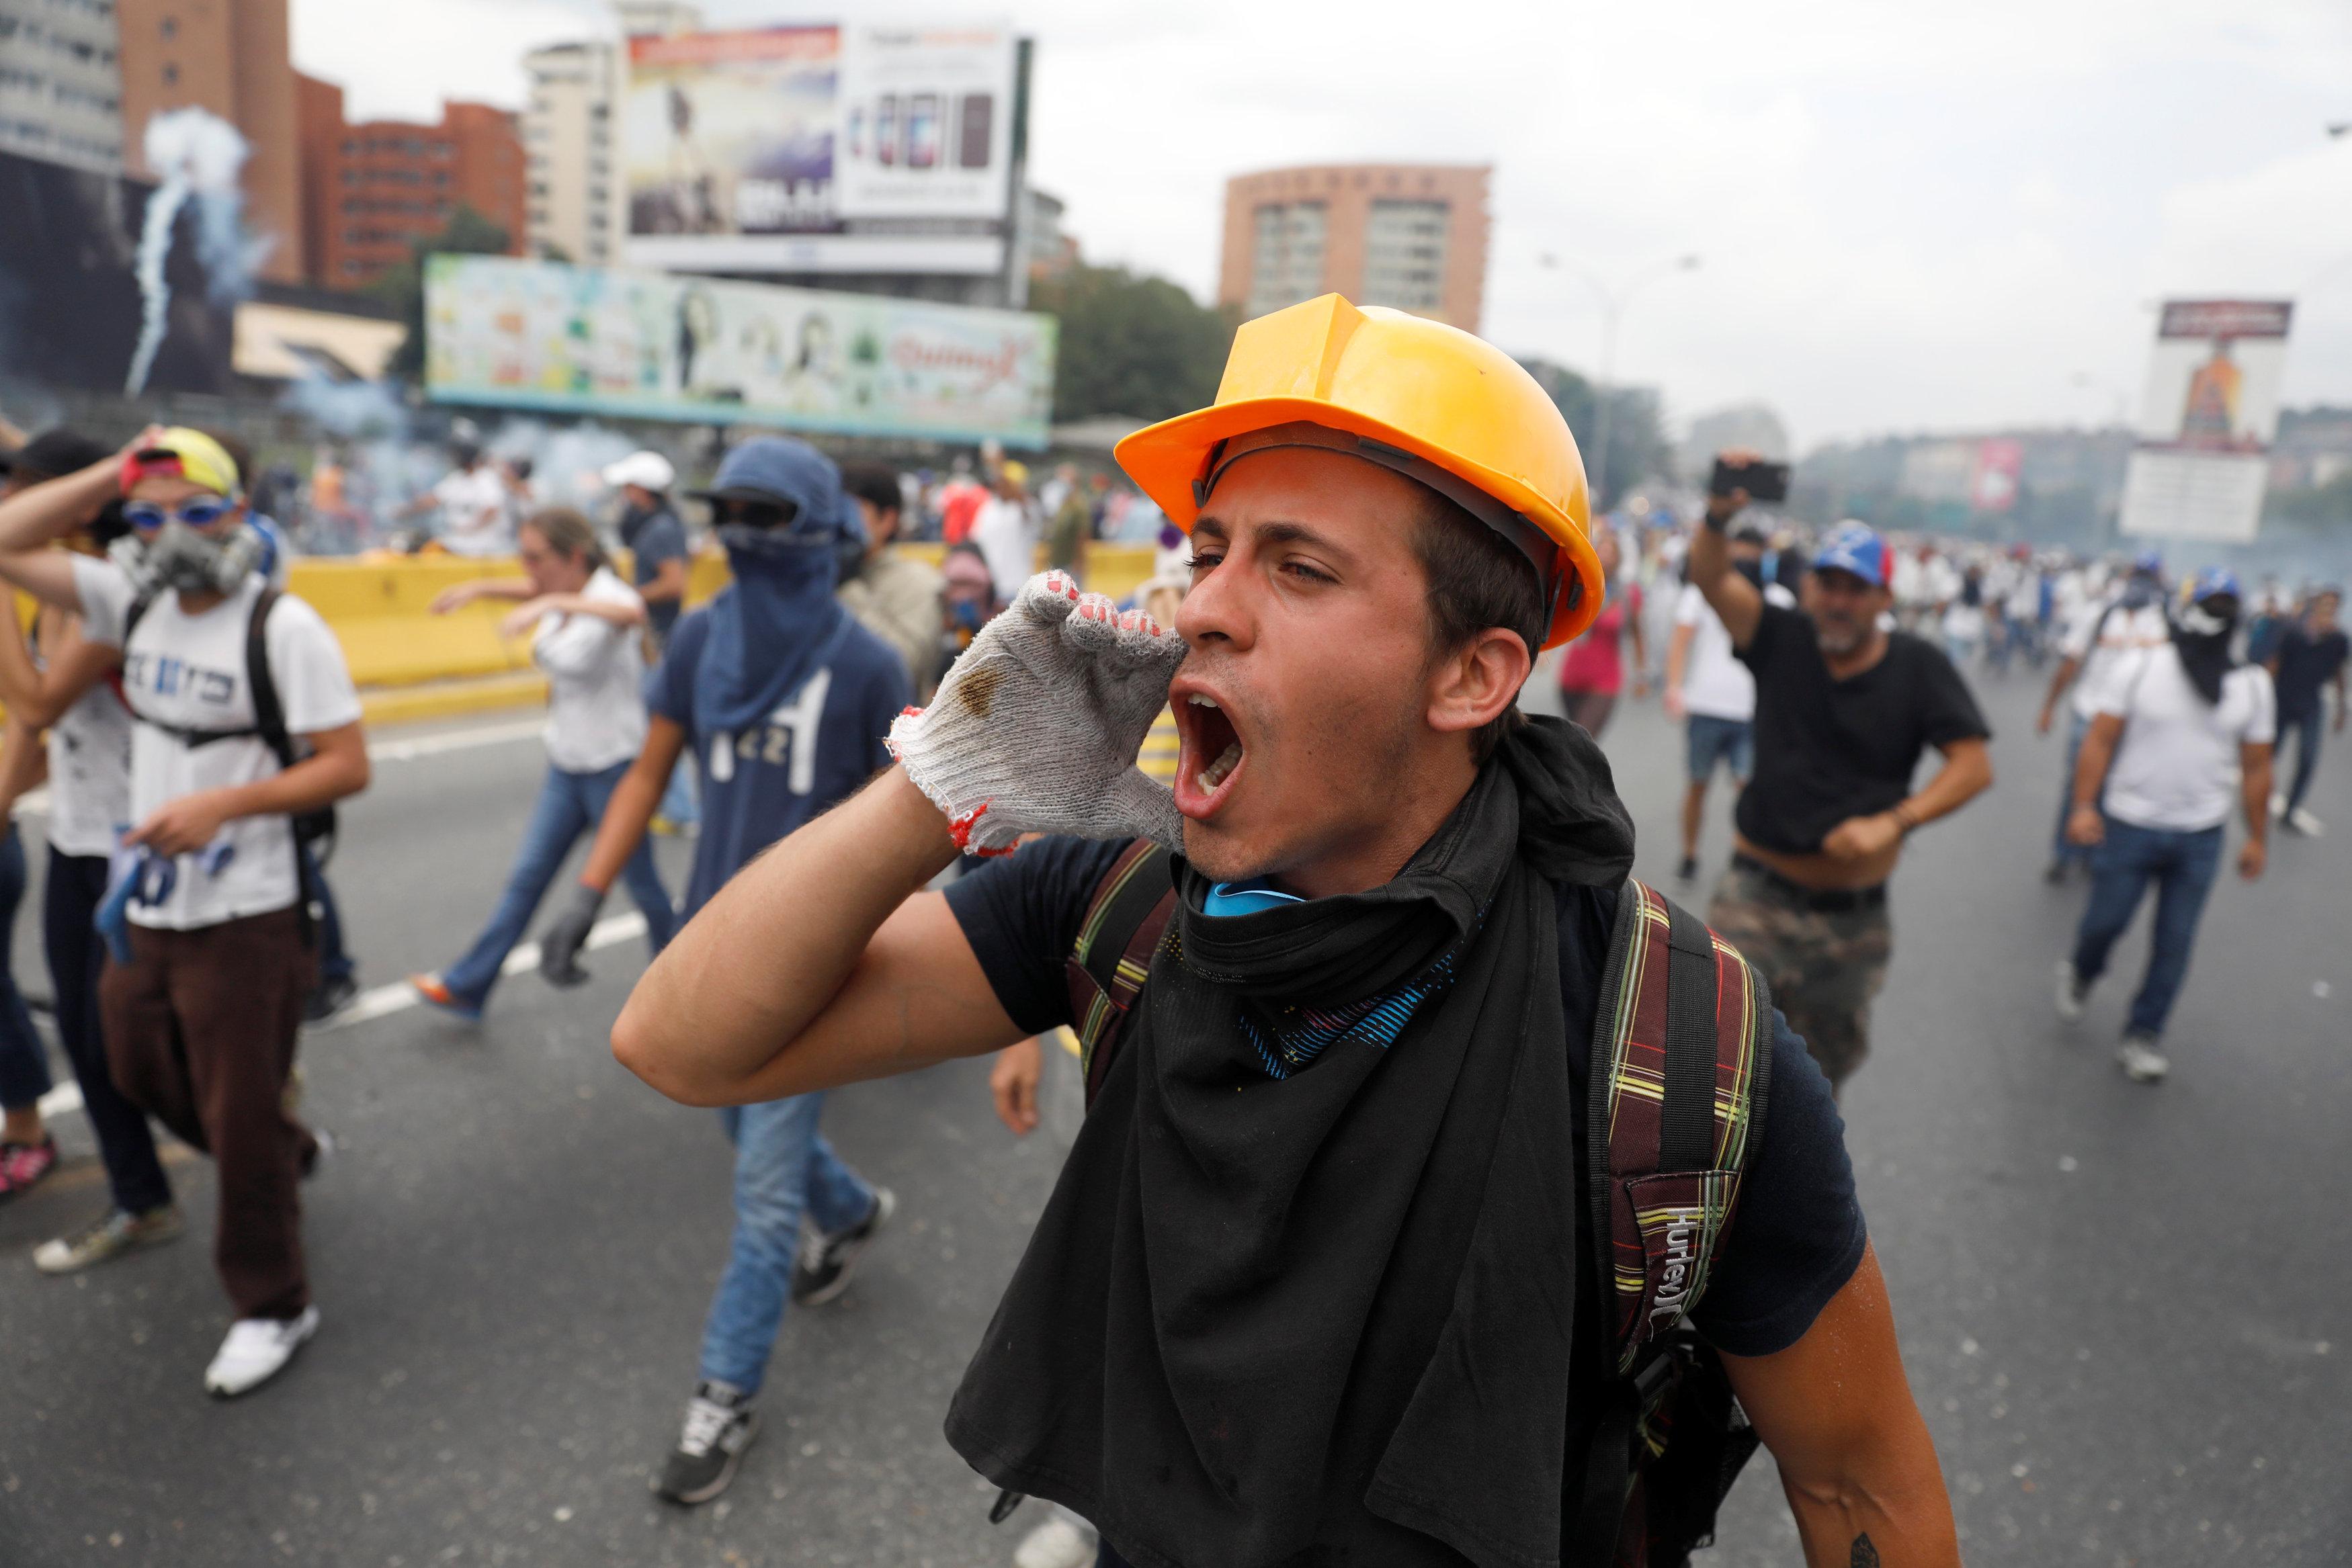 Opposition supporters rally against Venezuela's President Nicolas Maduro in Caracas, Venezuela, April 20, 2017. REUTERS/Carlos Garcia Rawlins